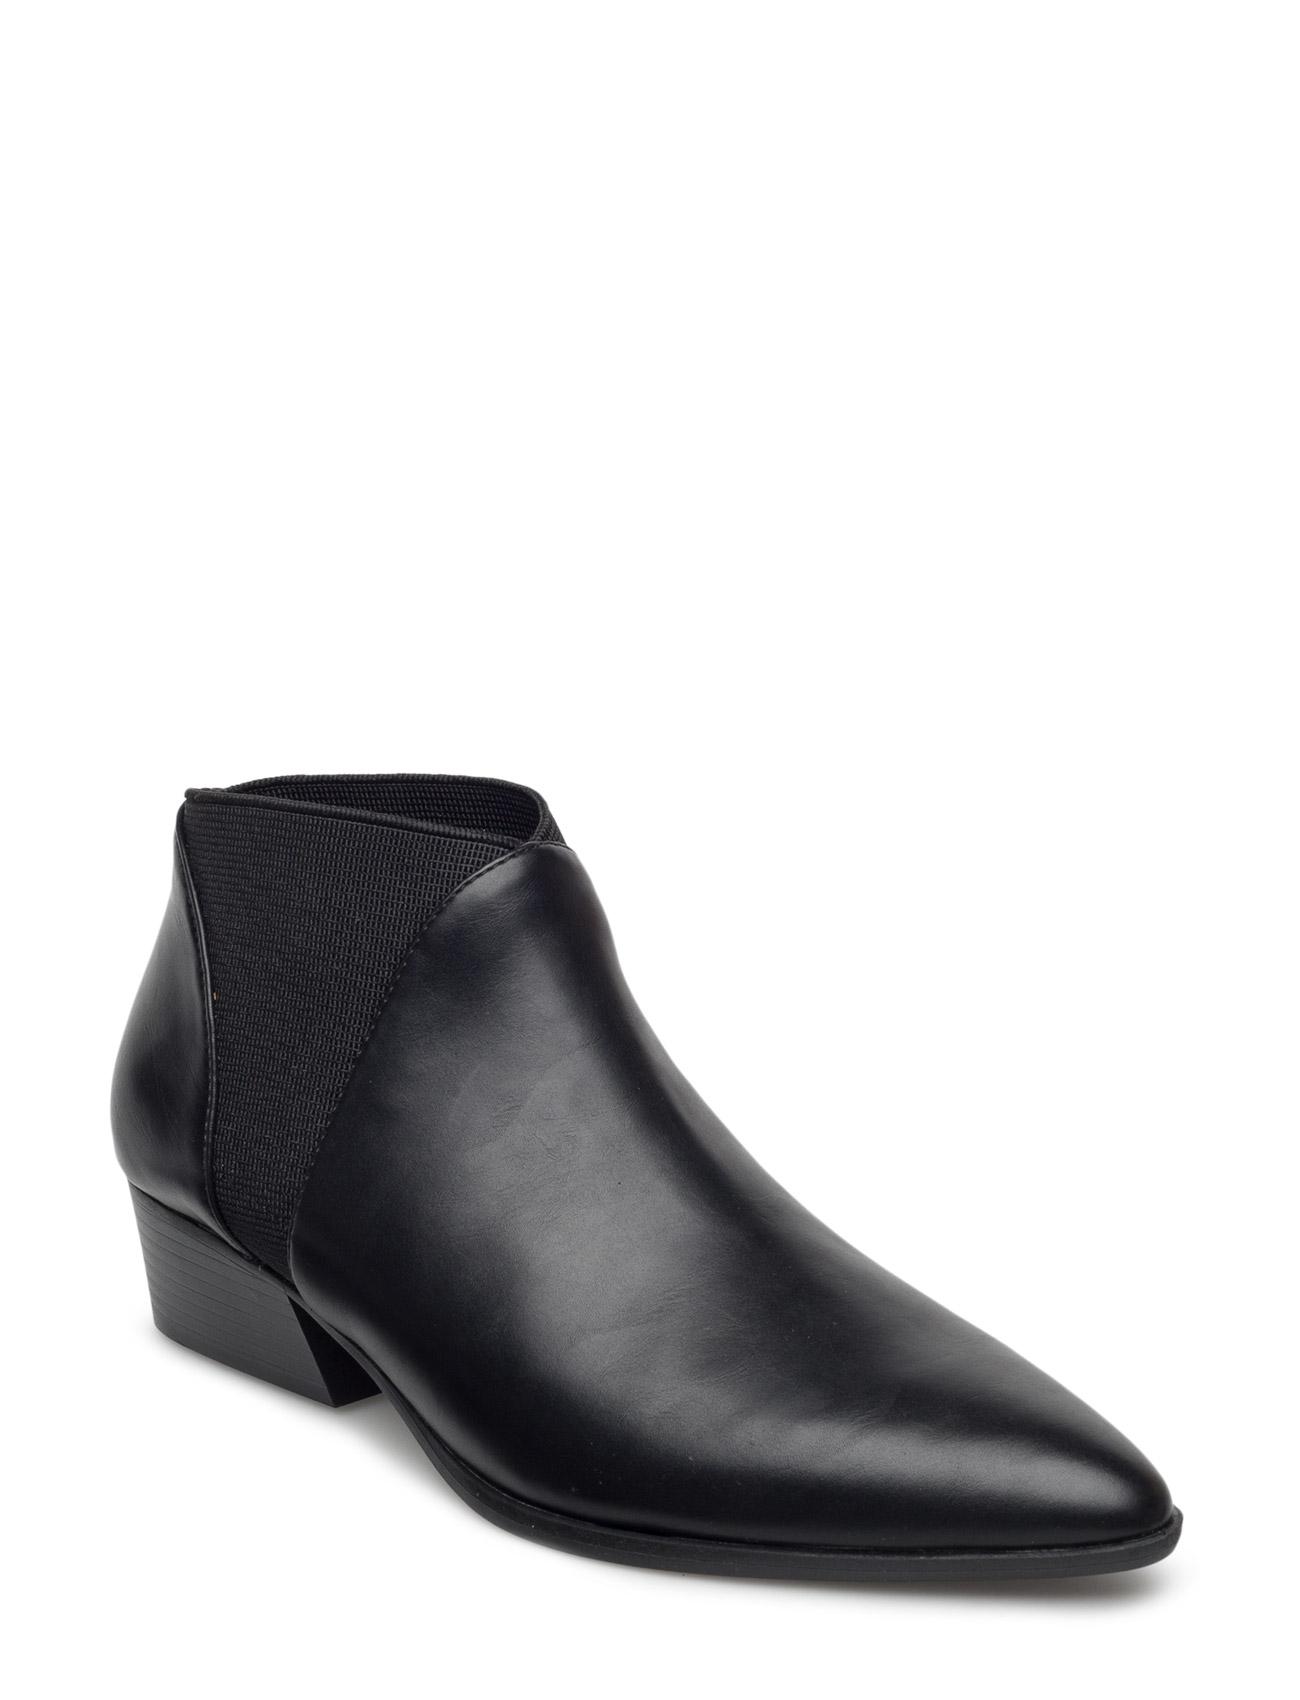 Elastic Panels Ankle Boot Mango Støvler til Kvinder i Sort